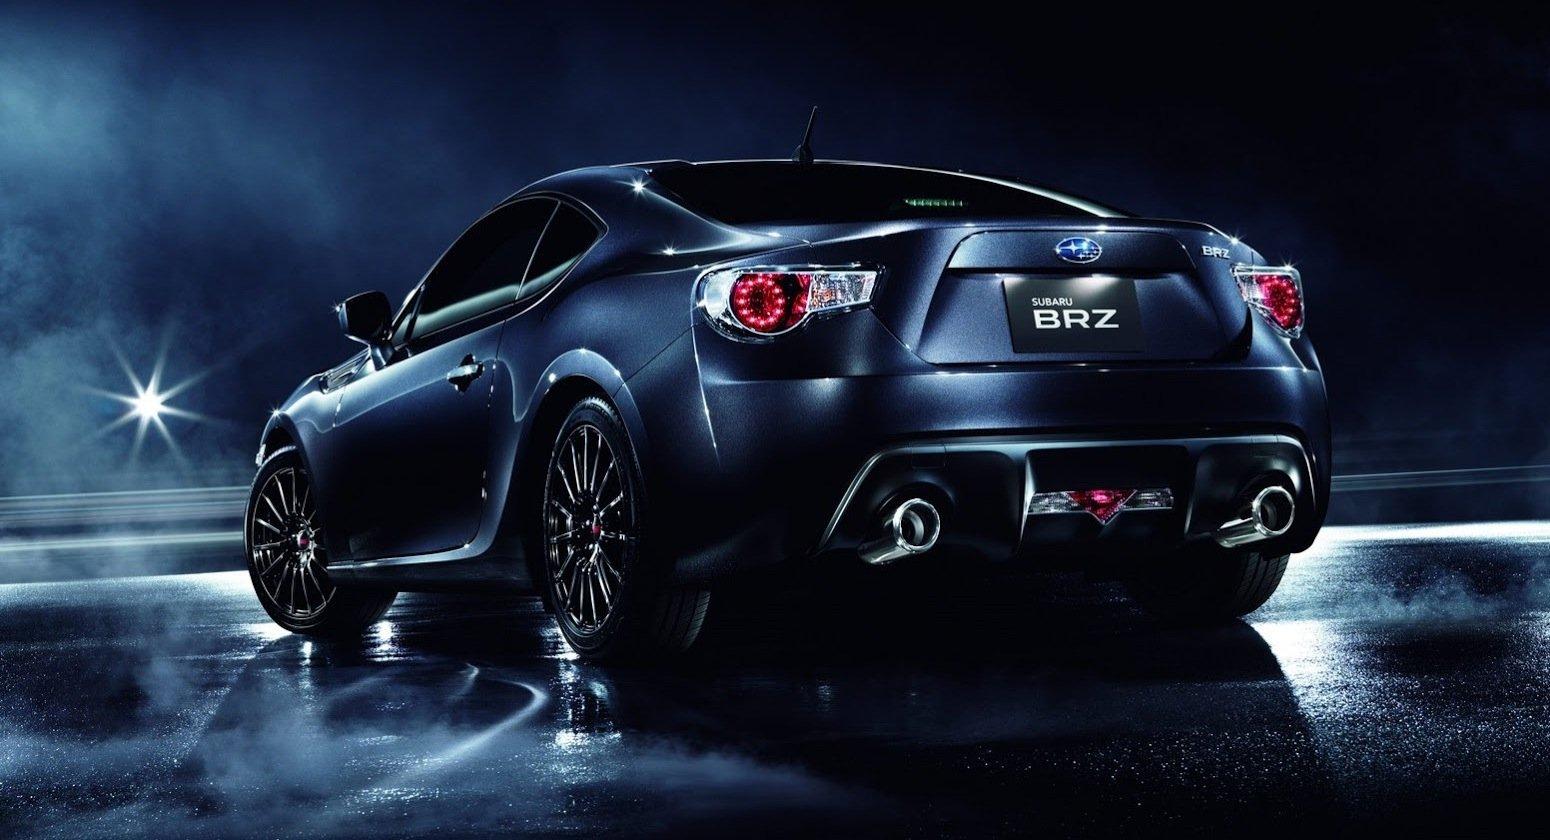 Subaru Brz Vs Toyota 86 >> Subaru BRZ Premium Sport Package: Japan-only special ...